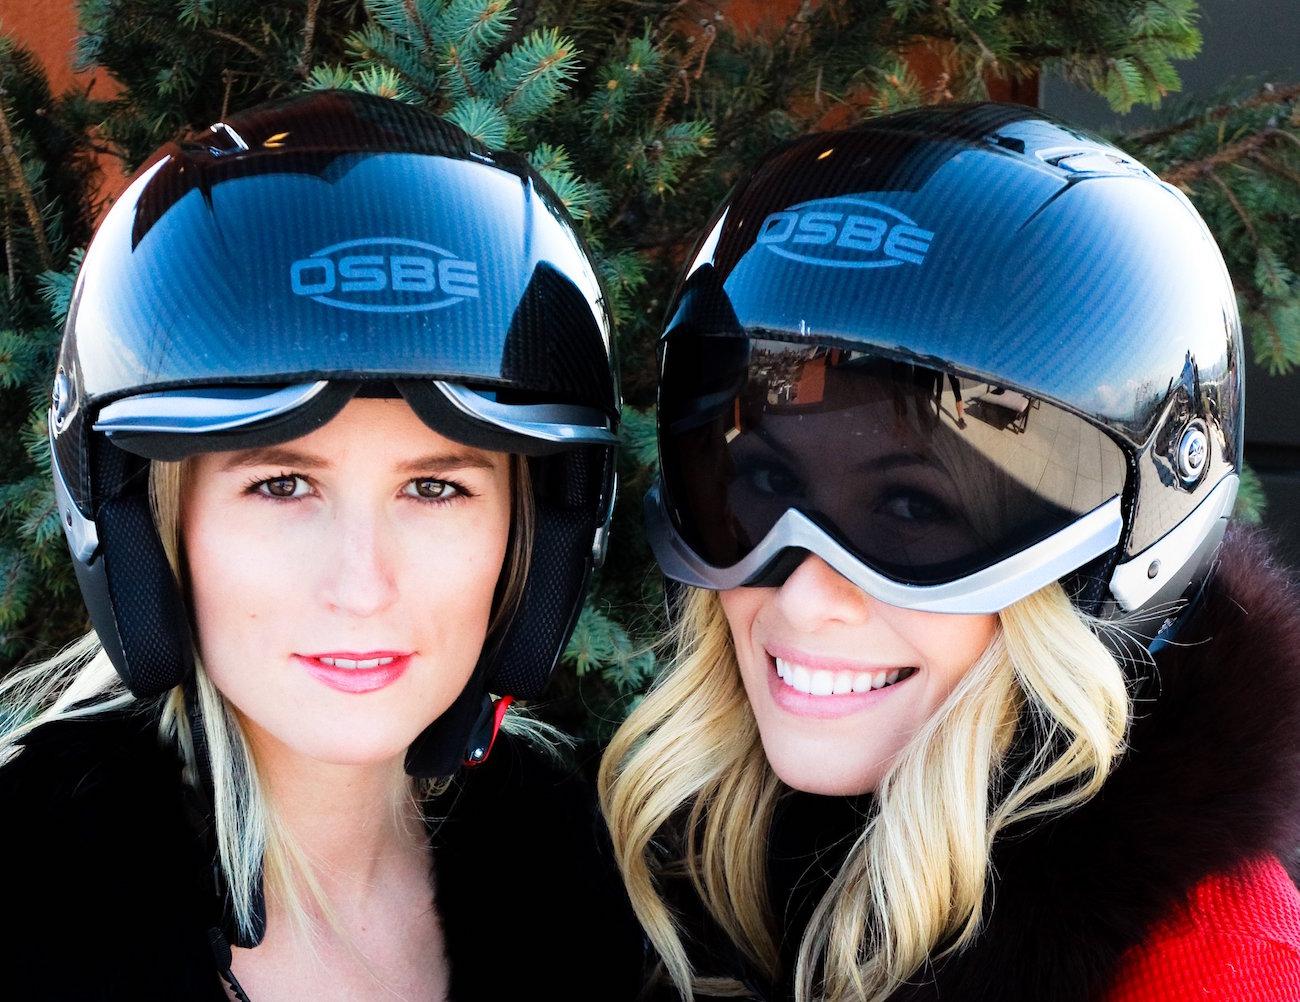 Majic Ski/Snowboard Helmet With an Integrated Visor by Osbe